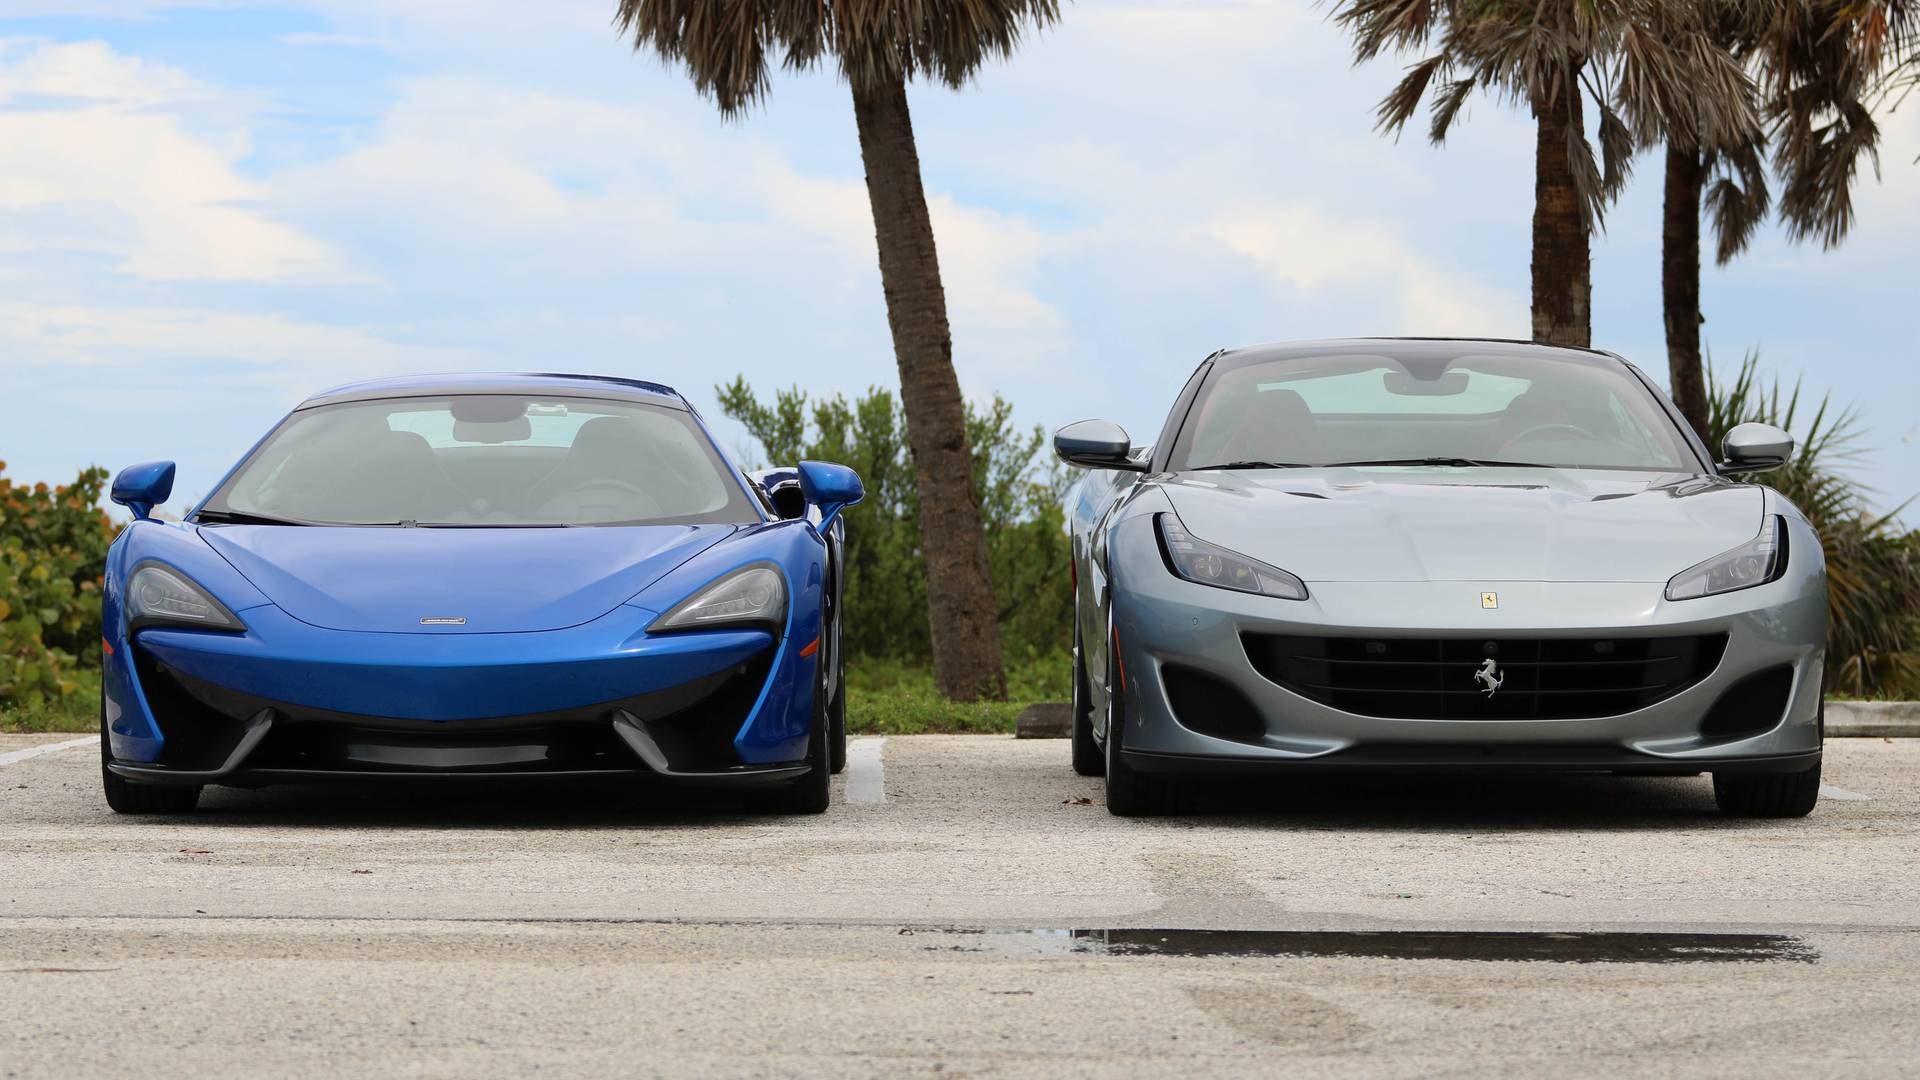 Mclaren 570s Spider Vs Ferrari Portofino Made For Miami